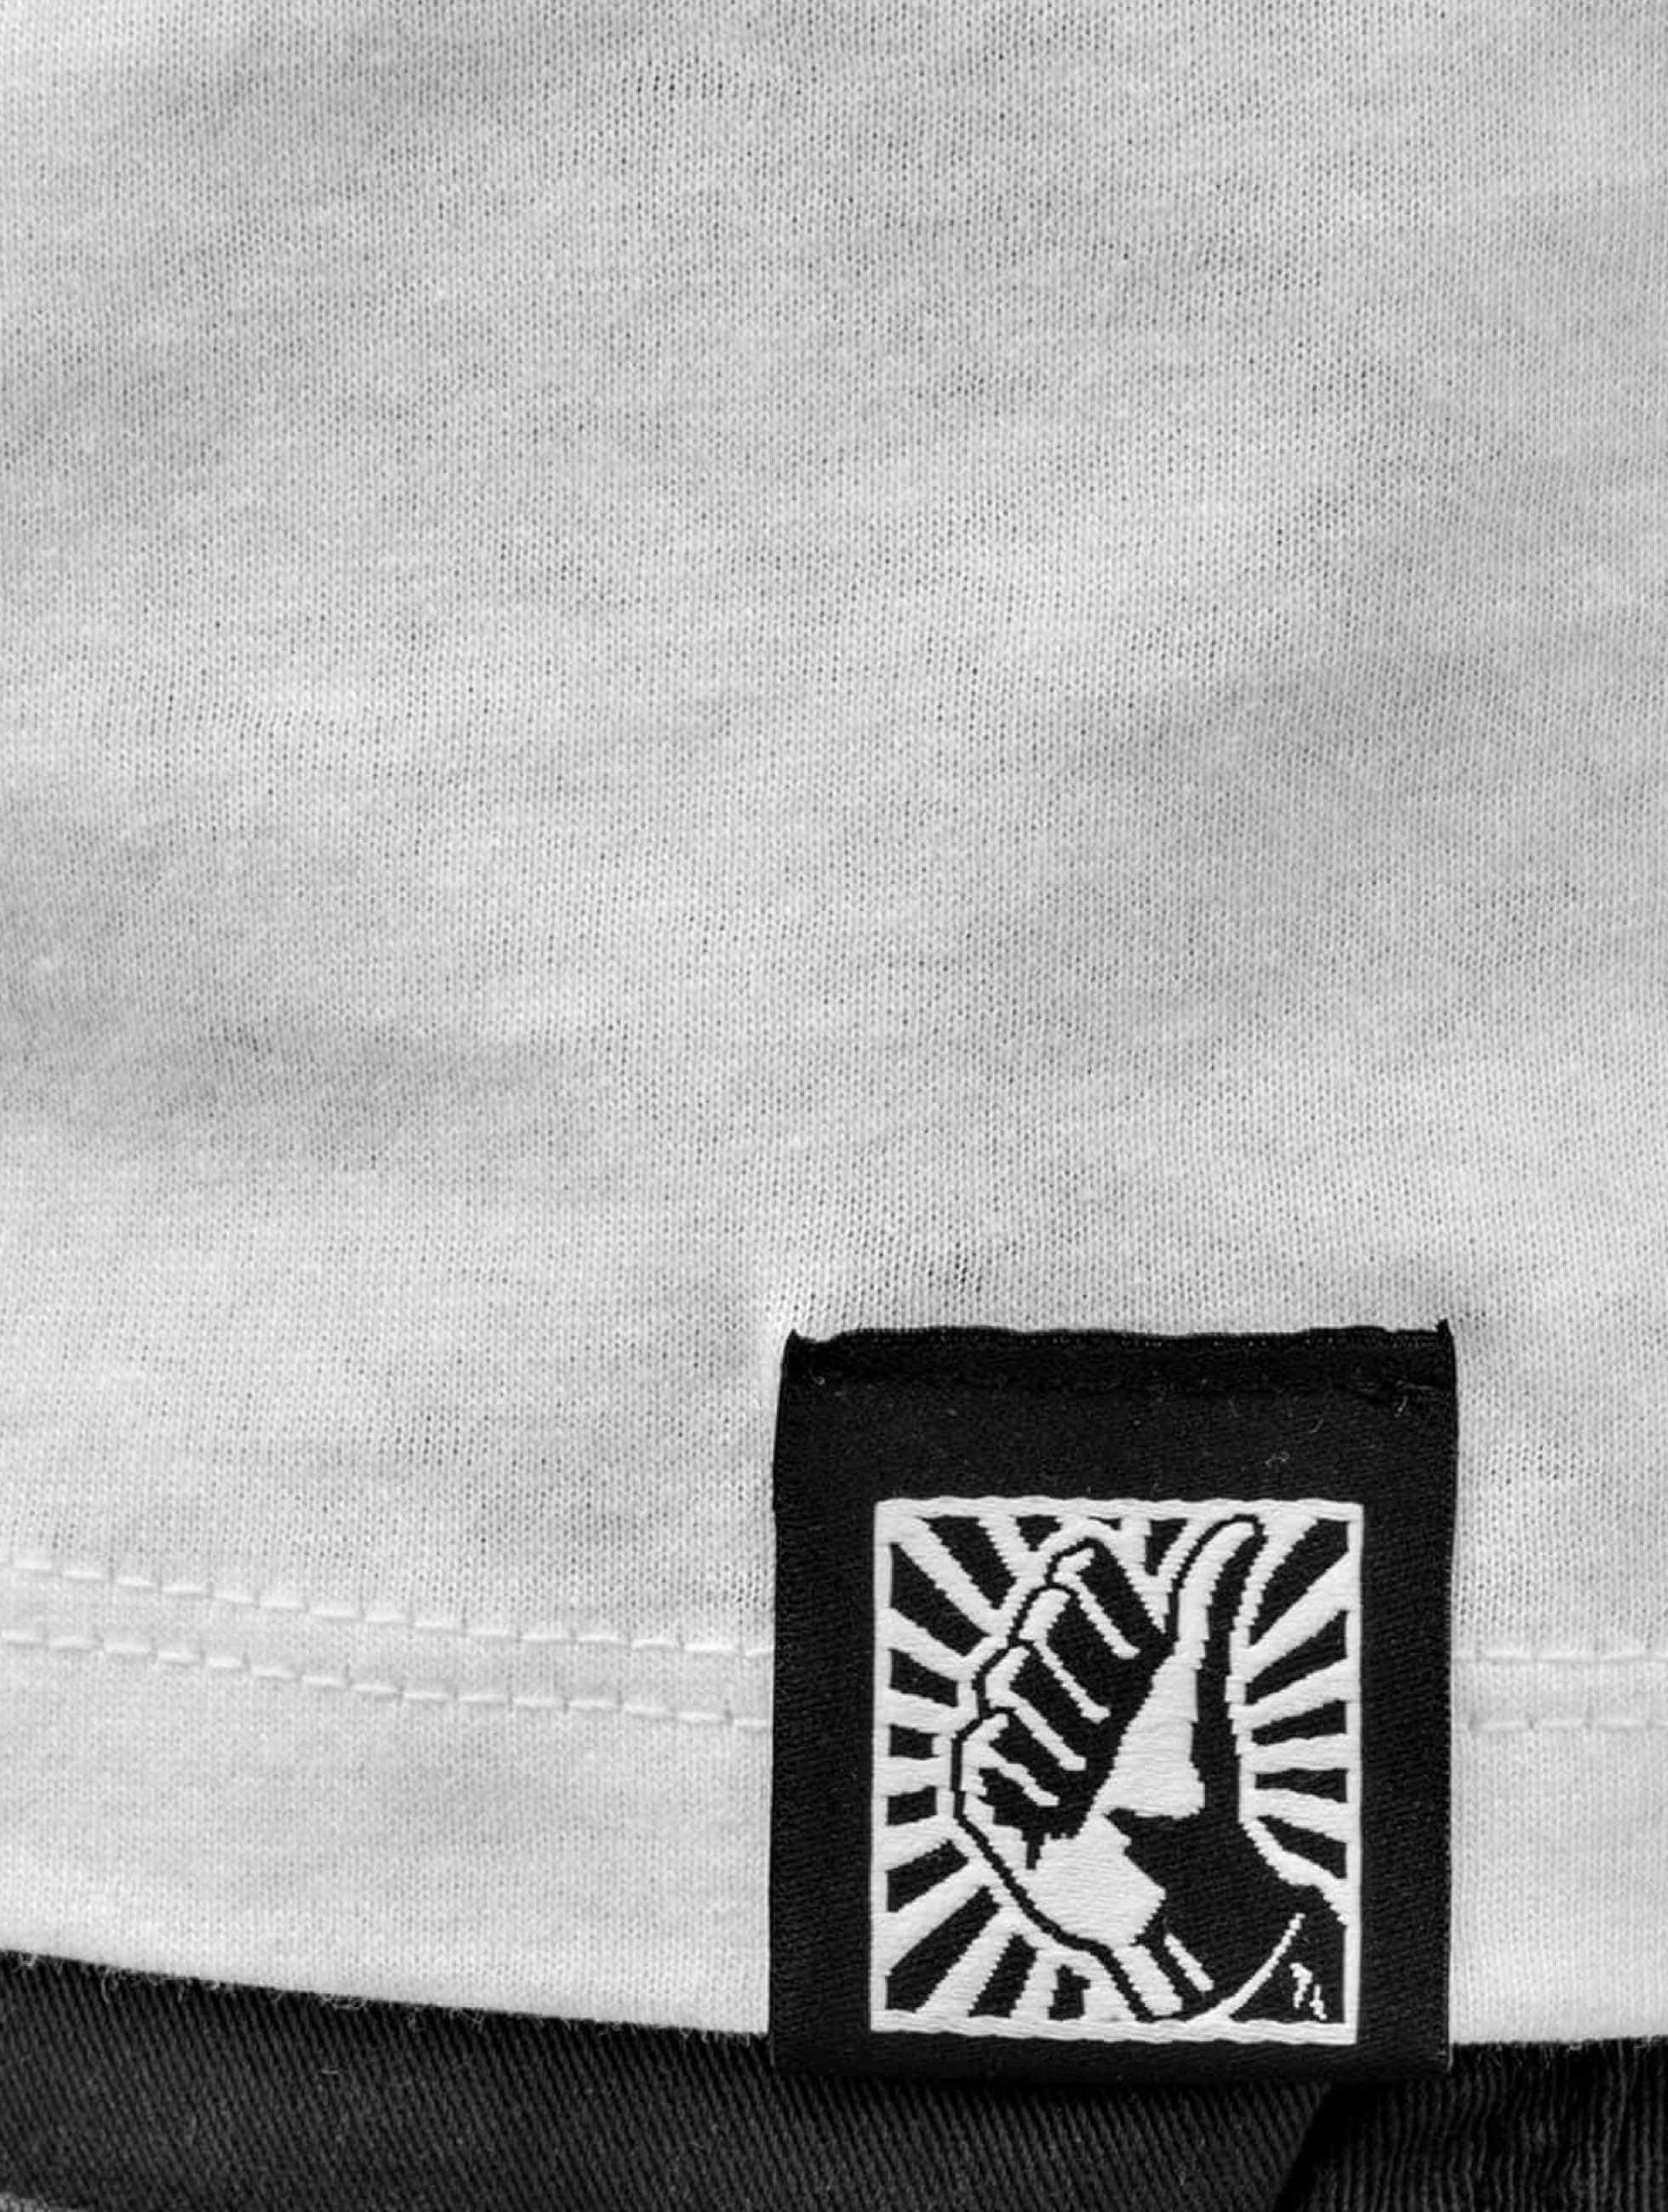 DefShop T-paidat Art Of Now Kaja Hort valkoinen